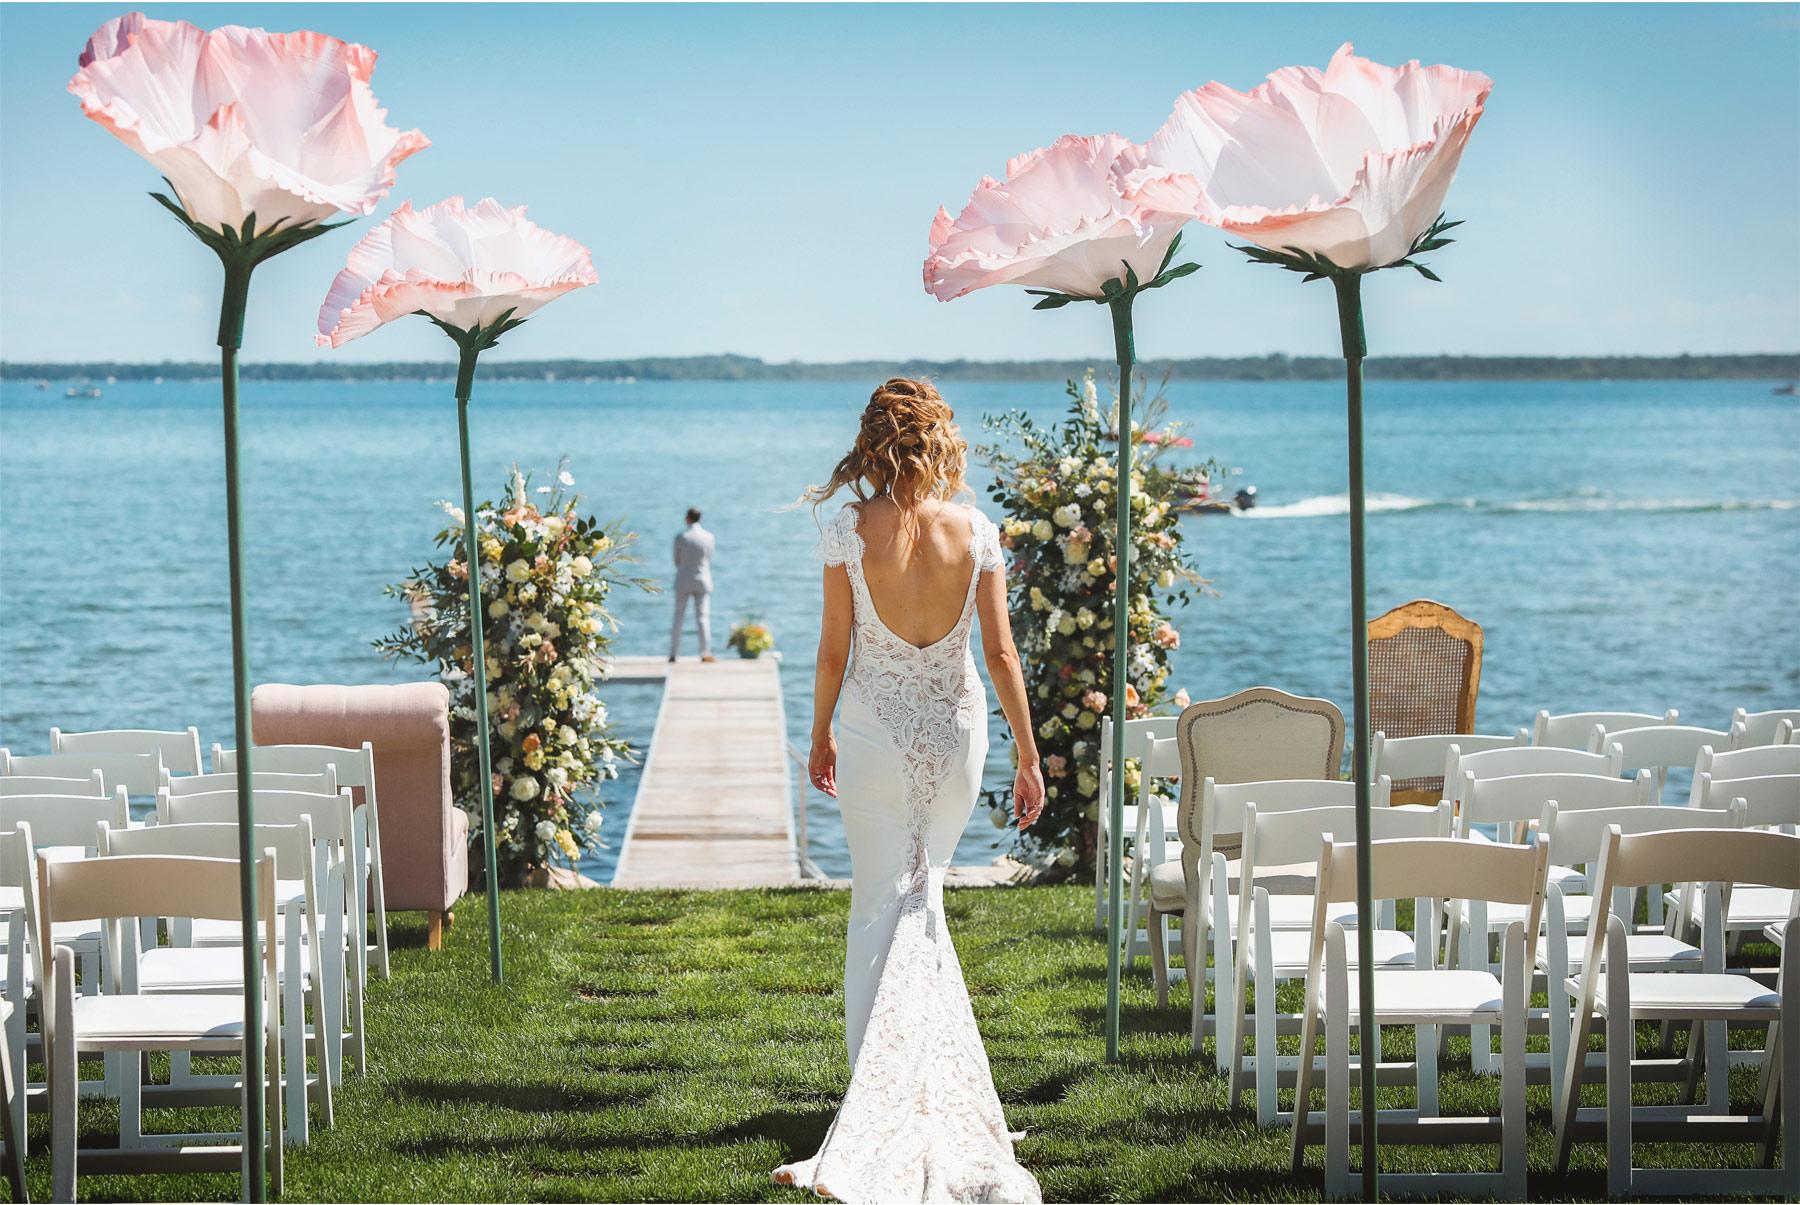 05-Vick-Photography-Wedding-Ottertail-Minnesota-Alice-in-Wonderland-Theme-First-Look-Bride-Groom-Lake-Giant-Poppys-Aisle-Tess-and-Greg.jpg